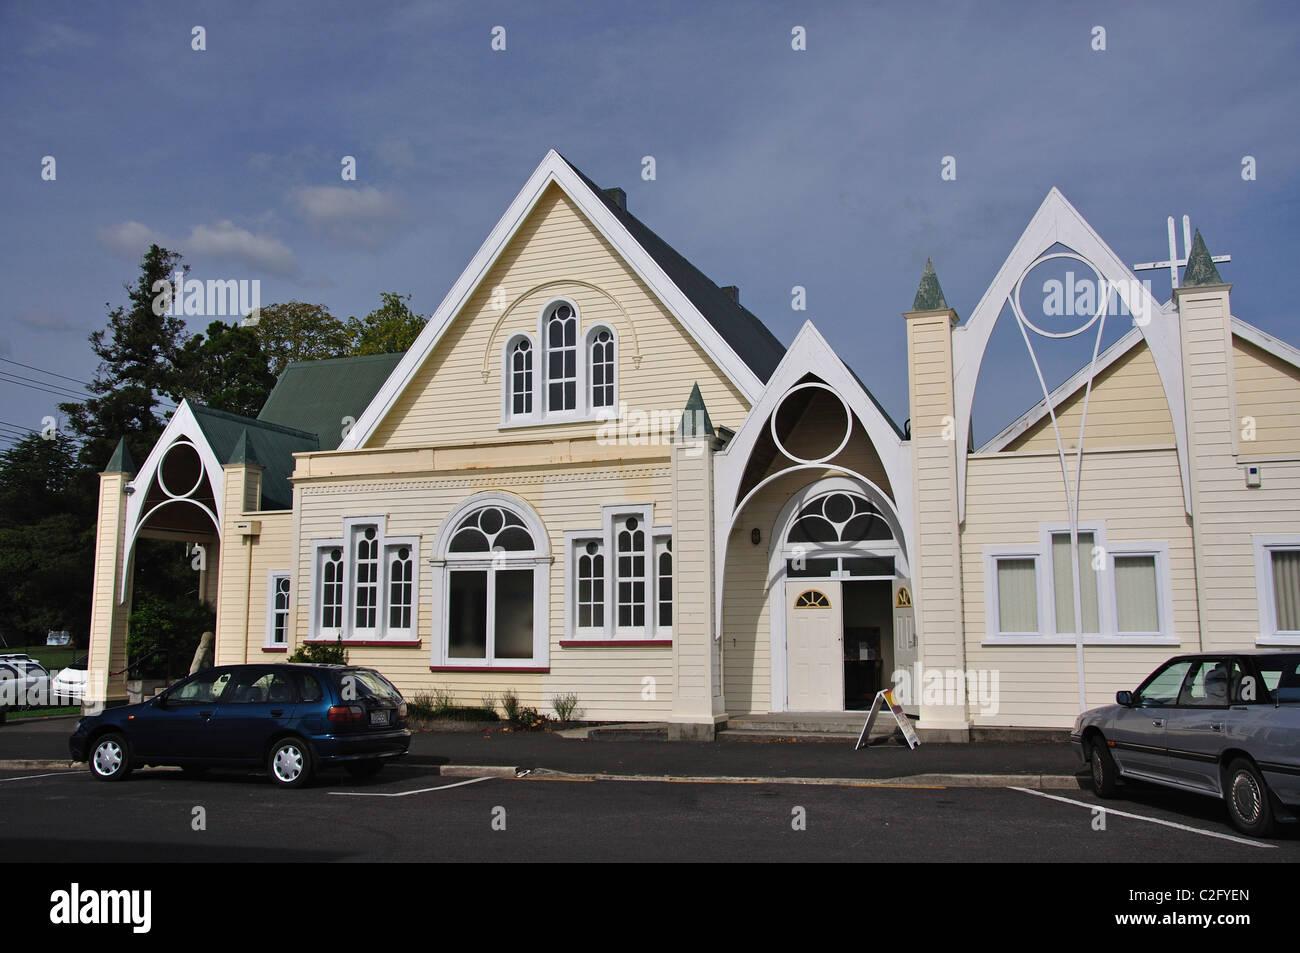 Coopérant Paeroa Church, rue MacKay, Paeroa, de la région de Waikato, Nouvelle-Zélande, île Photo Stock